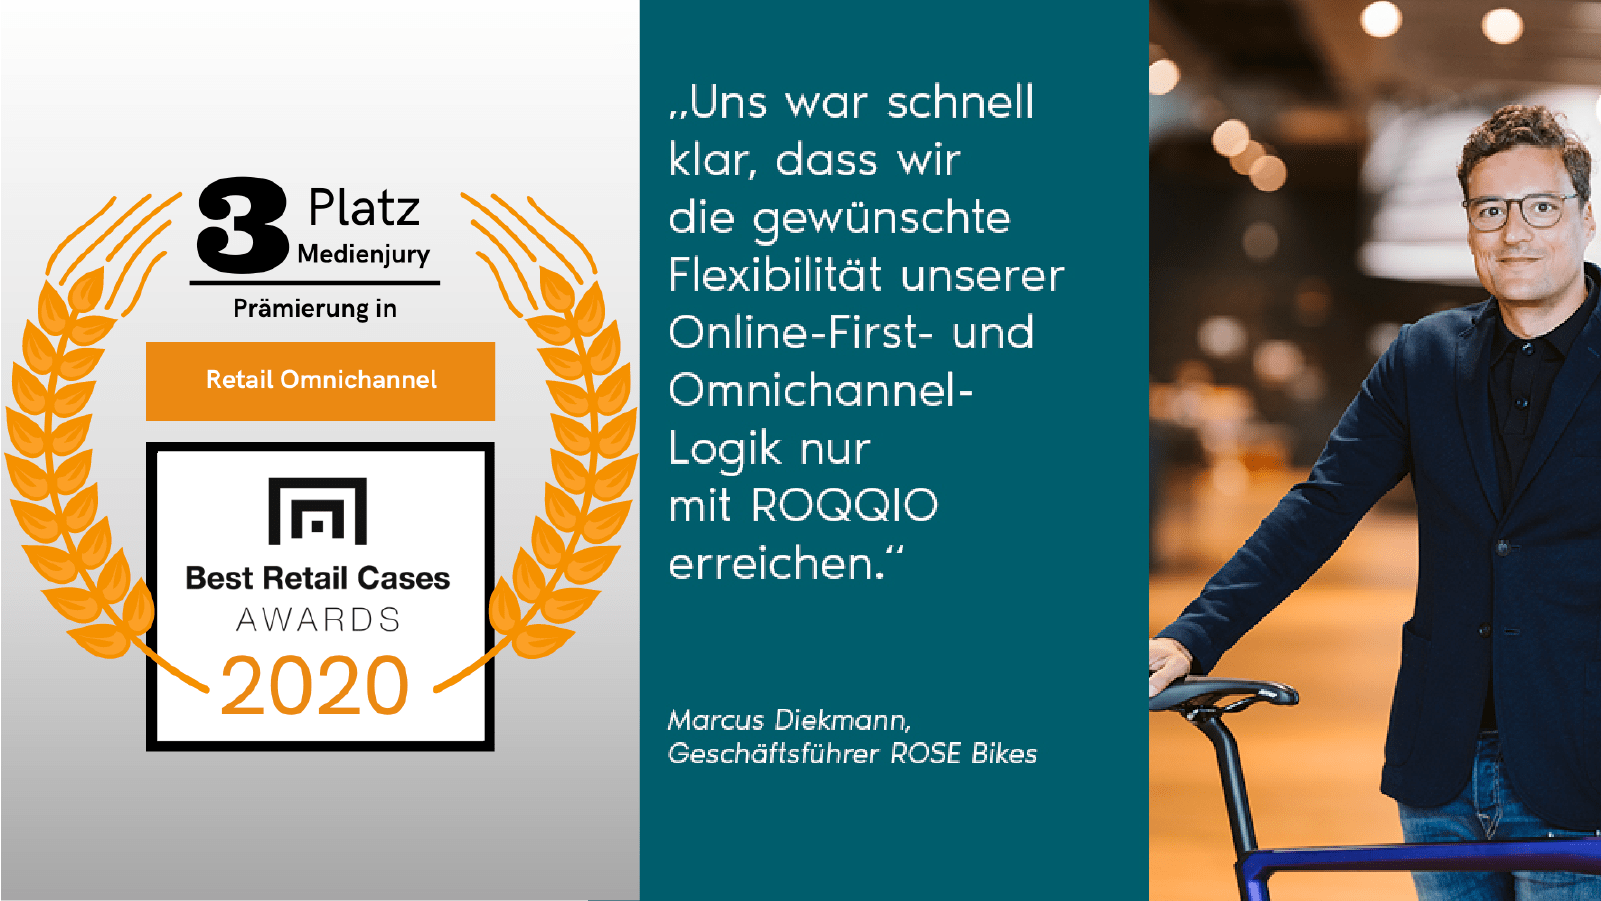 ROSE Bikes: Omnichannel Commerce Solution (mit ROQQIO)